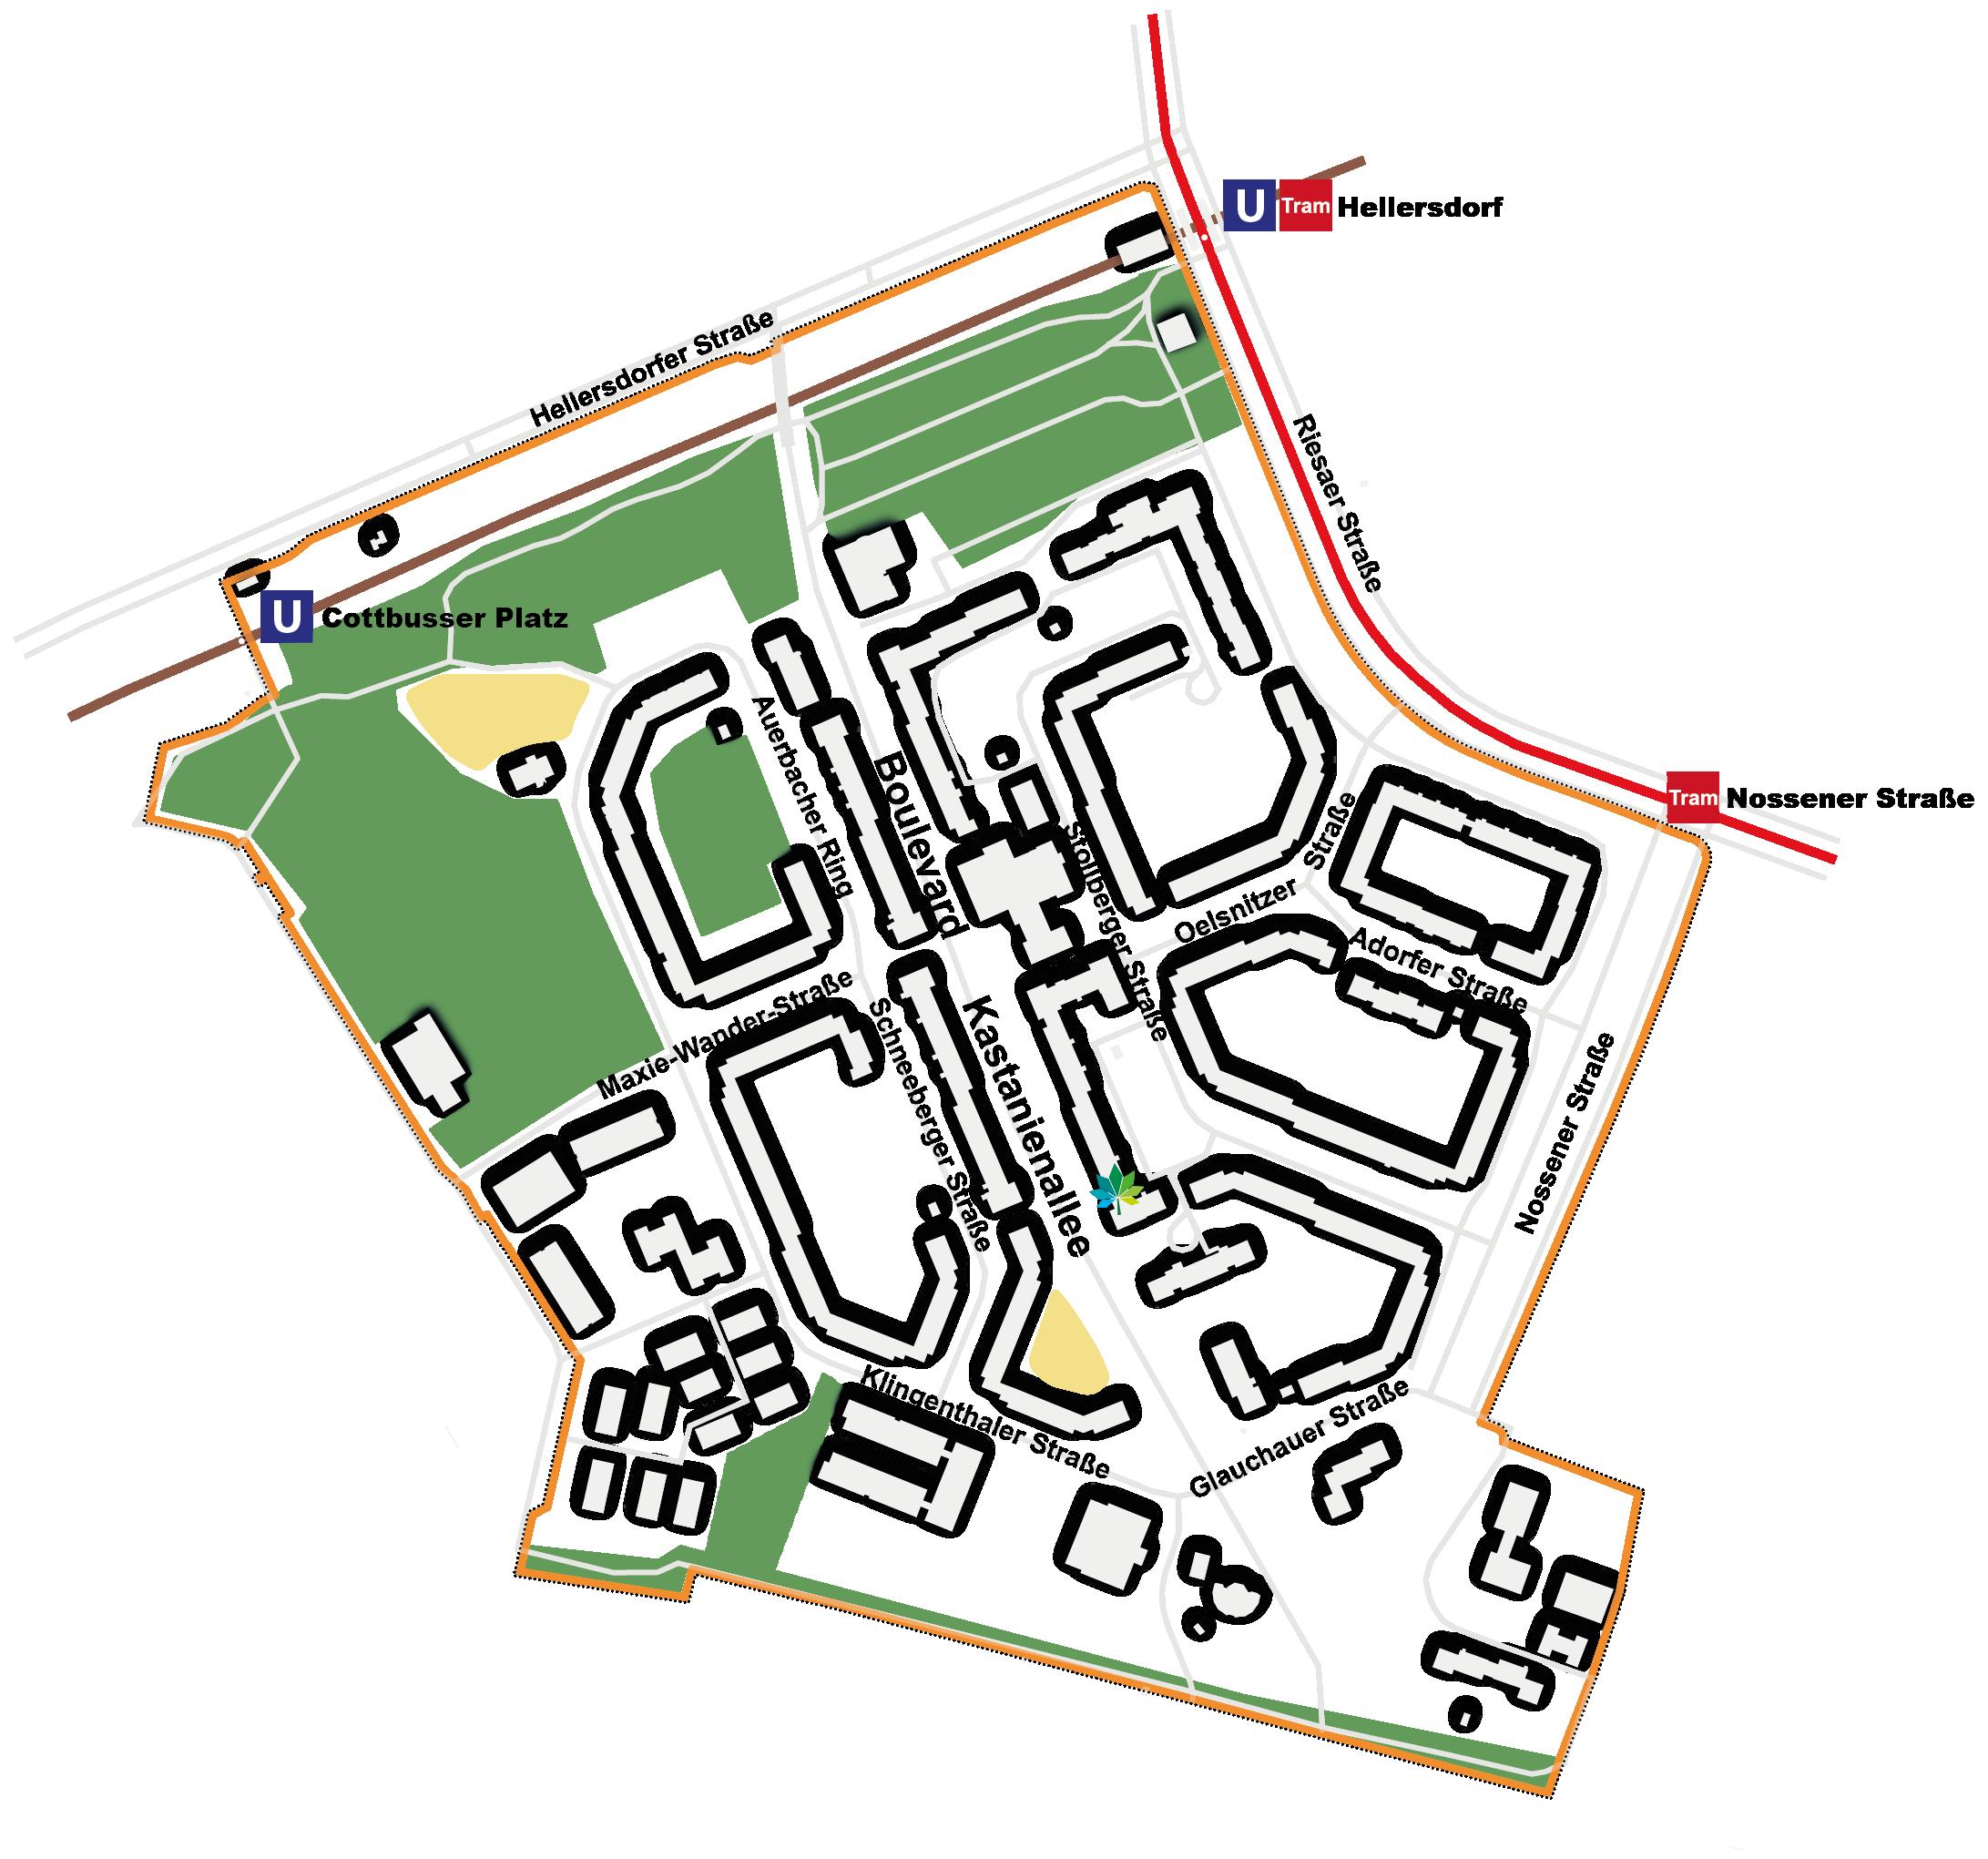 Gebietskarte des Quartiersmanagements Boulevard Kastanienallee